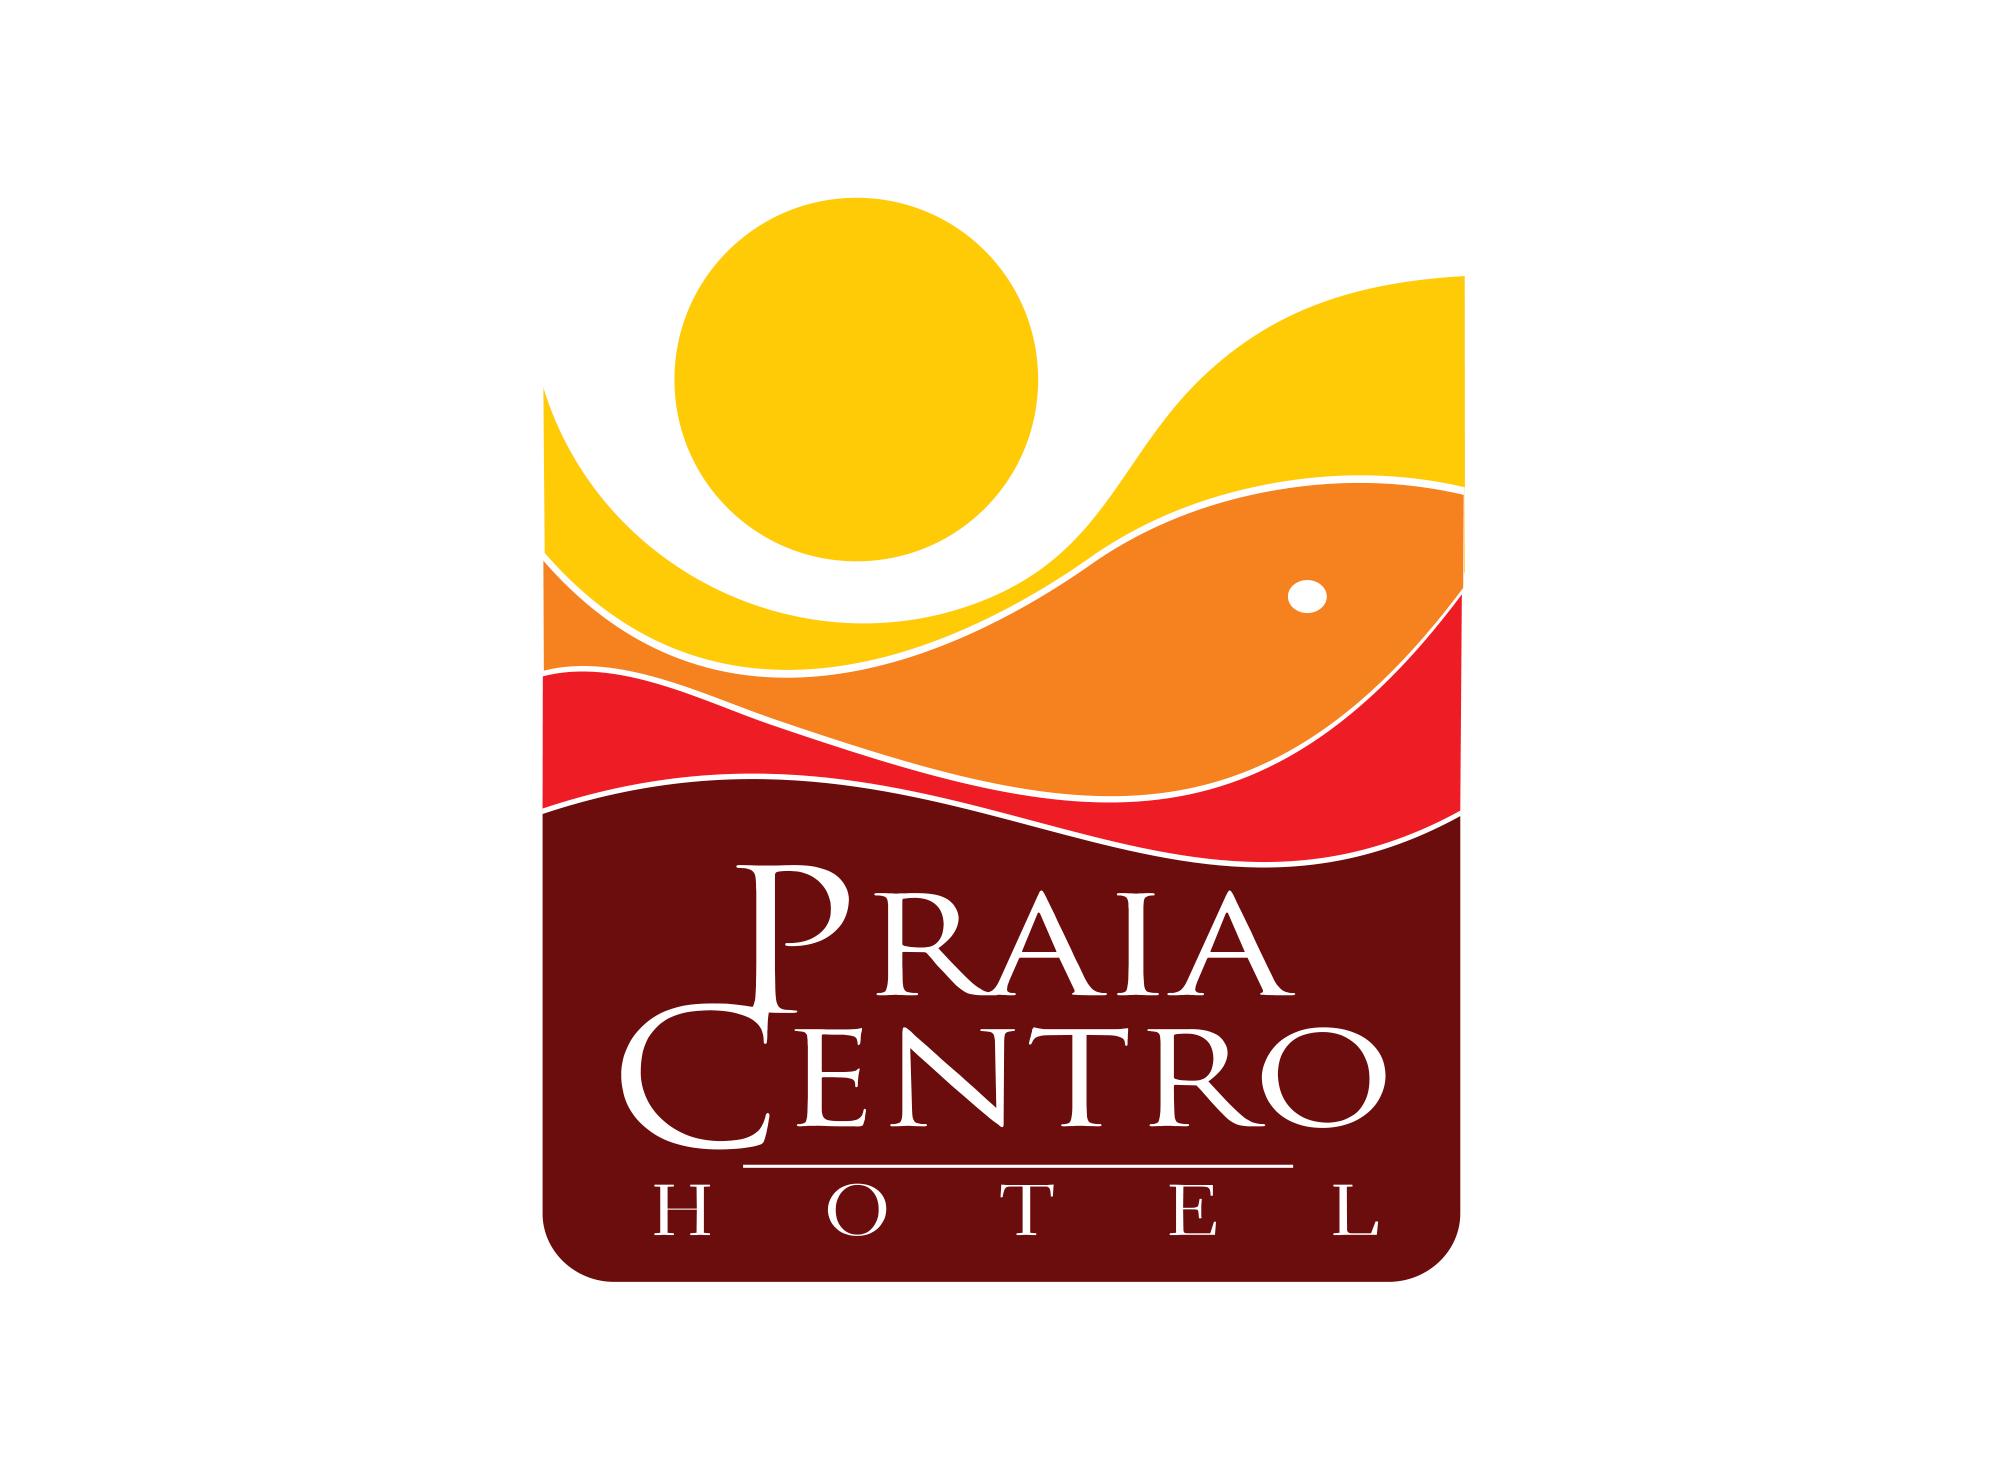 praia-centro-hotel-clientes-agencia-diretriz-digital-marketing-fortaleza